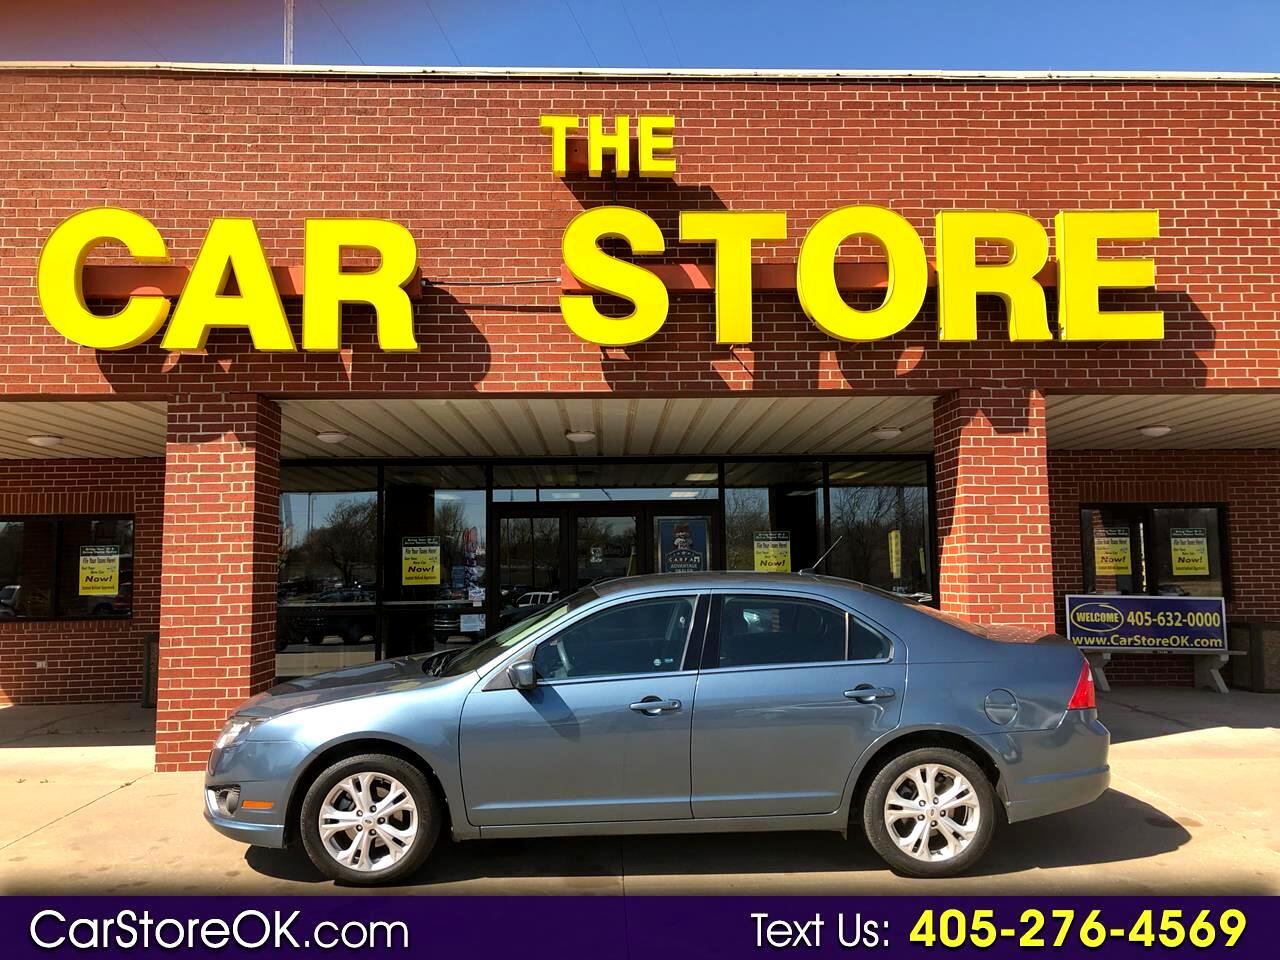 2012 Ford Fusion 4dr Sdn SE FWD